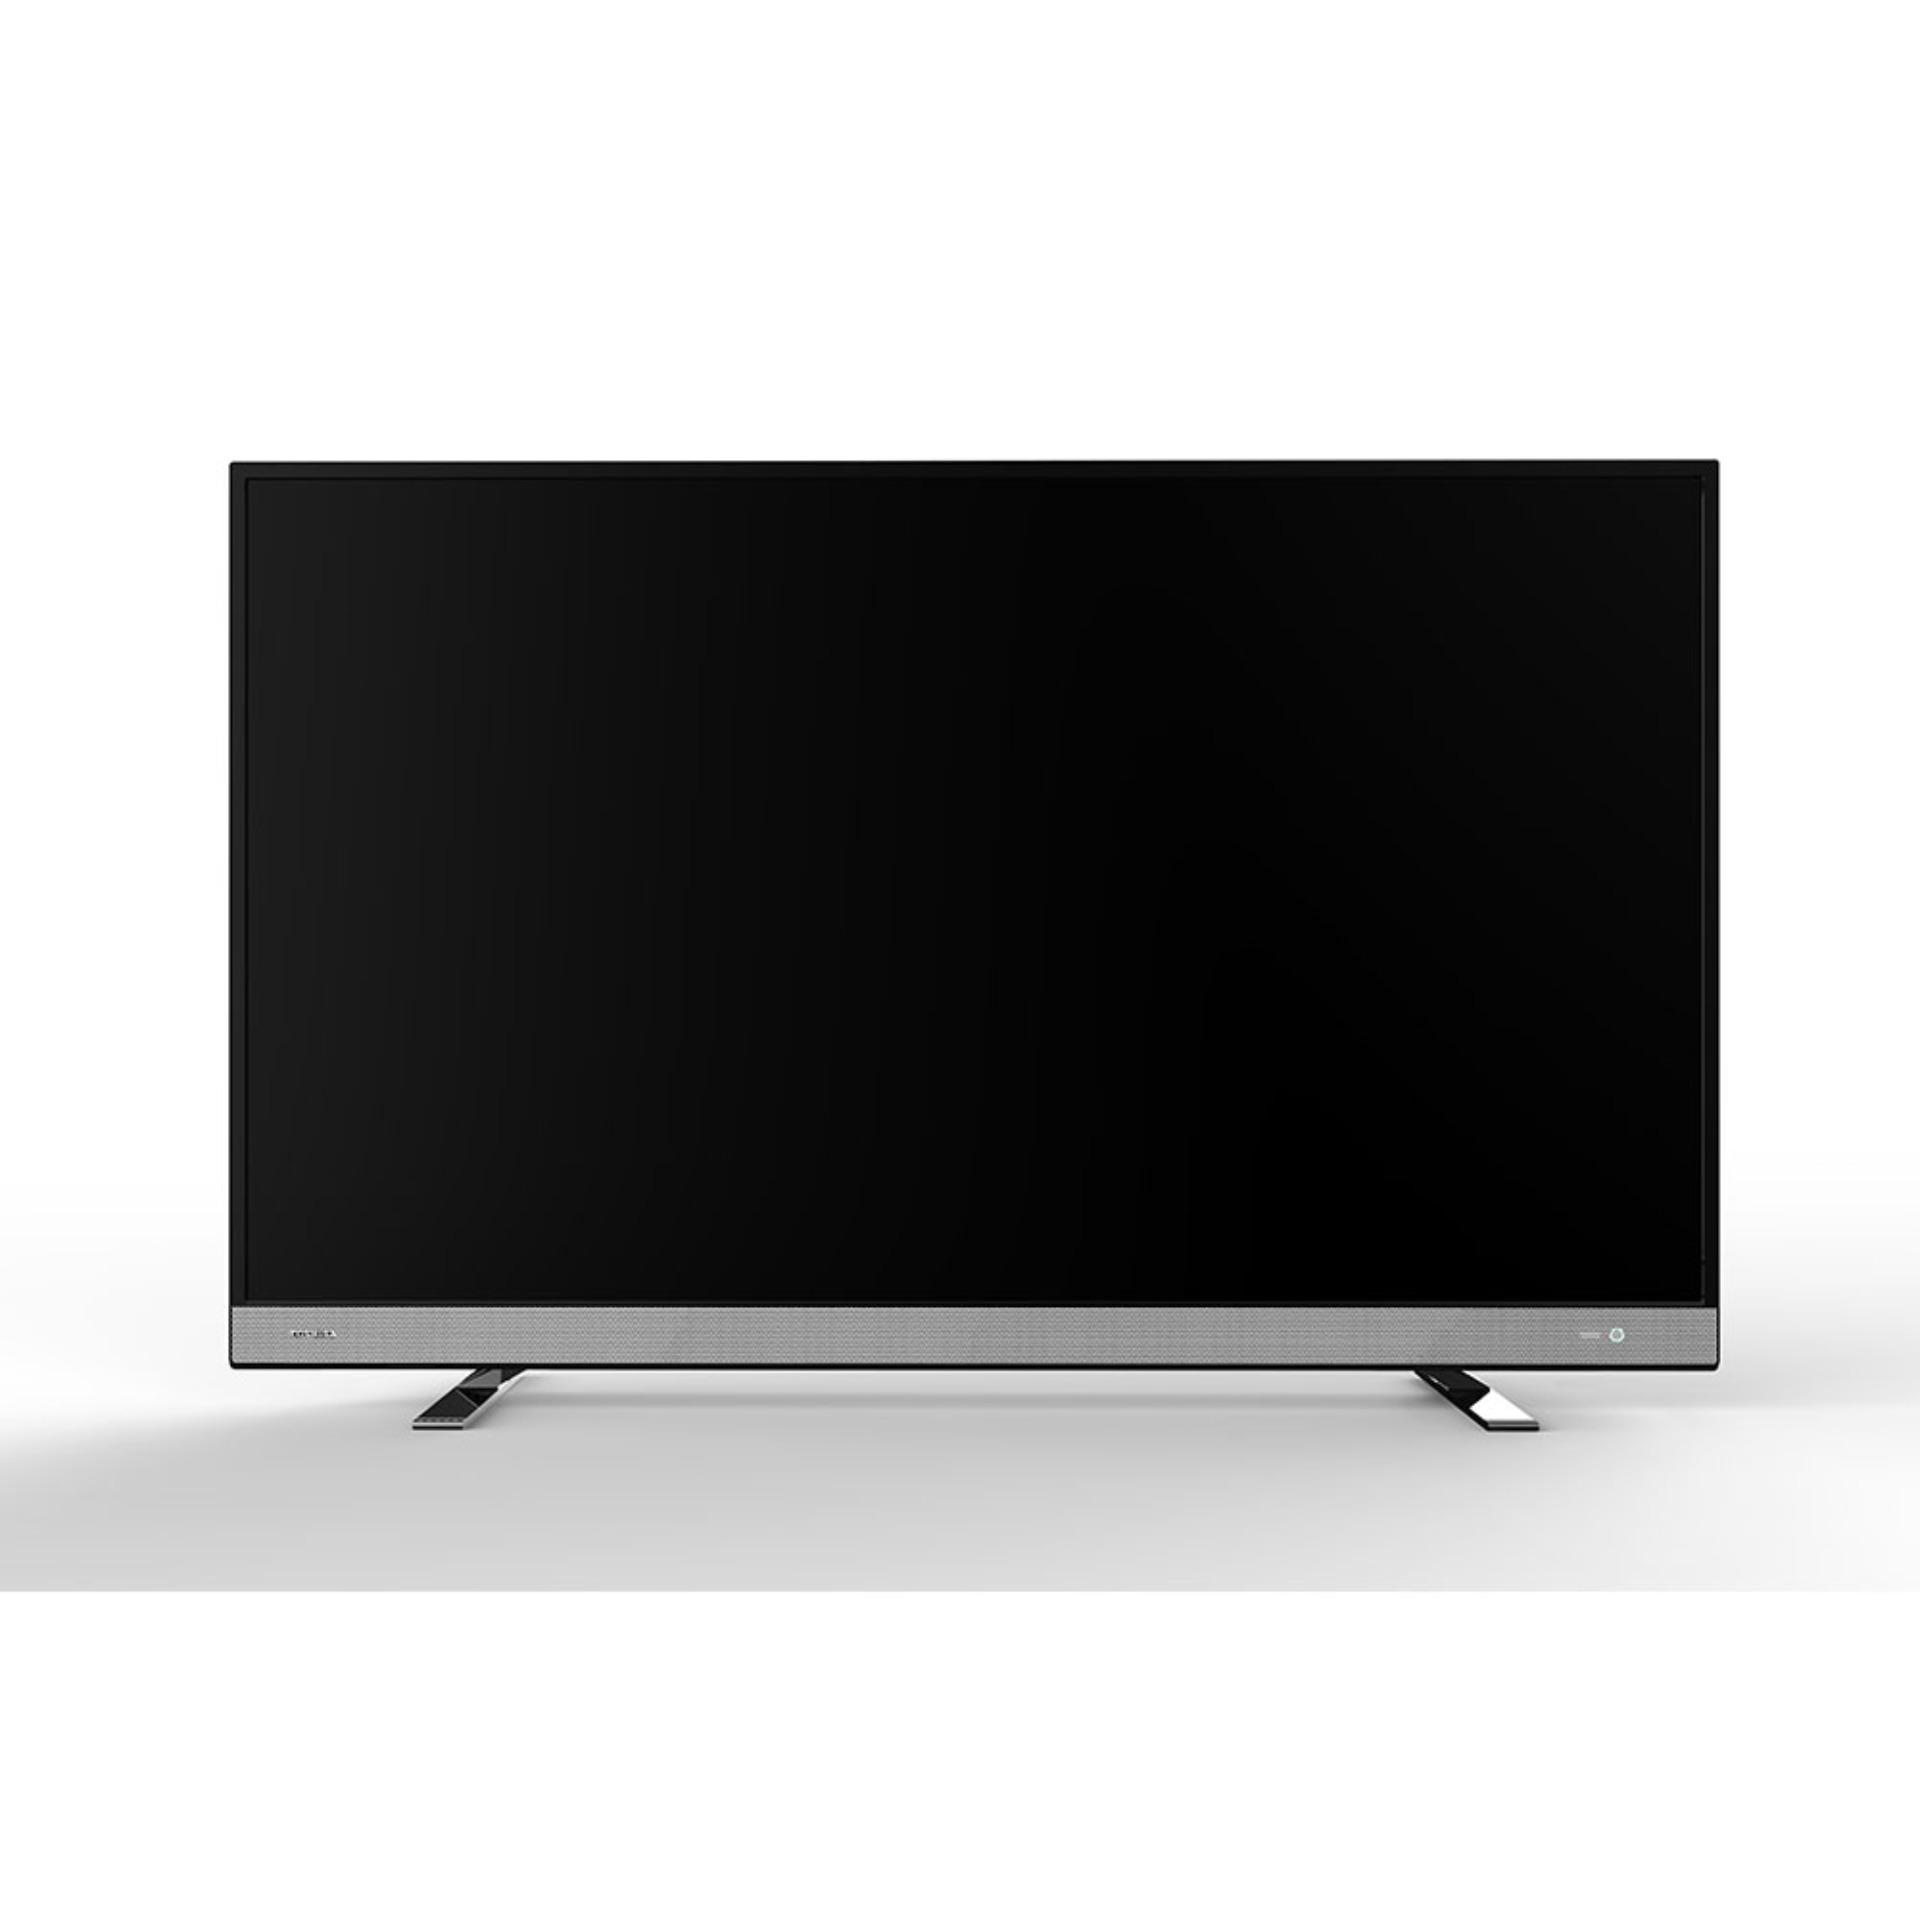 Toshiba Led 4K UHD Smart TV 43U6750 FREE ONGKIR SURABAYA